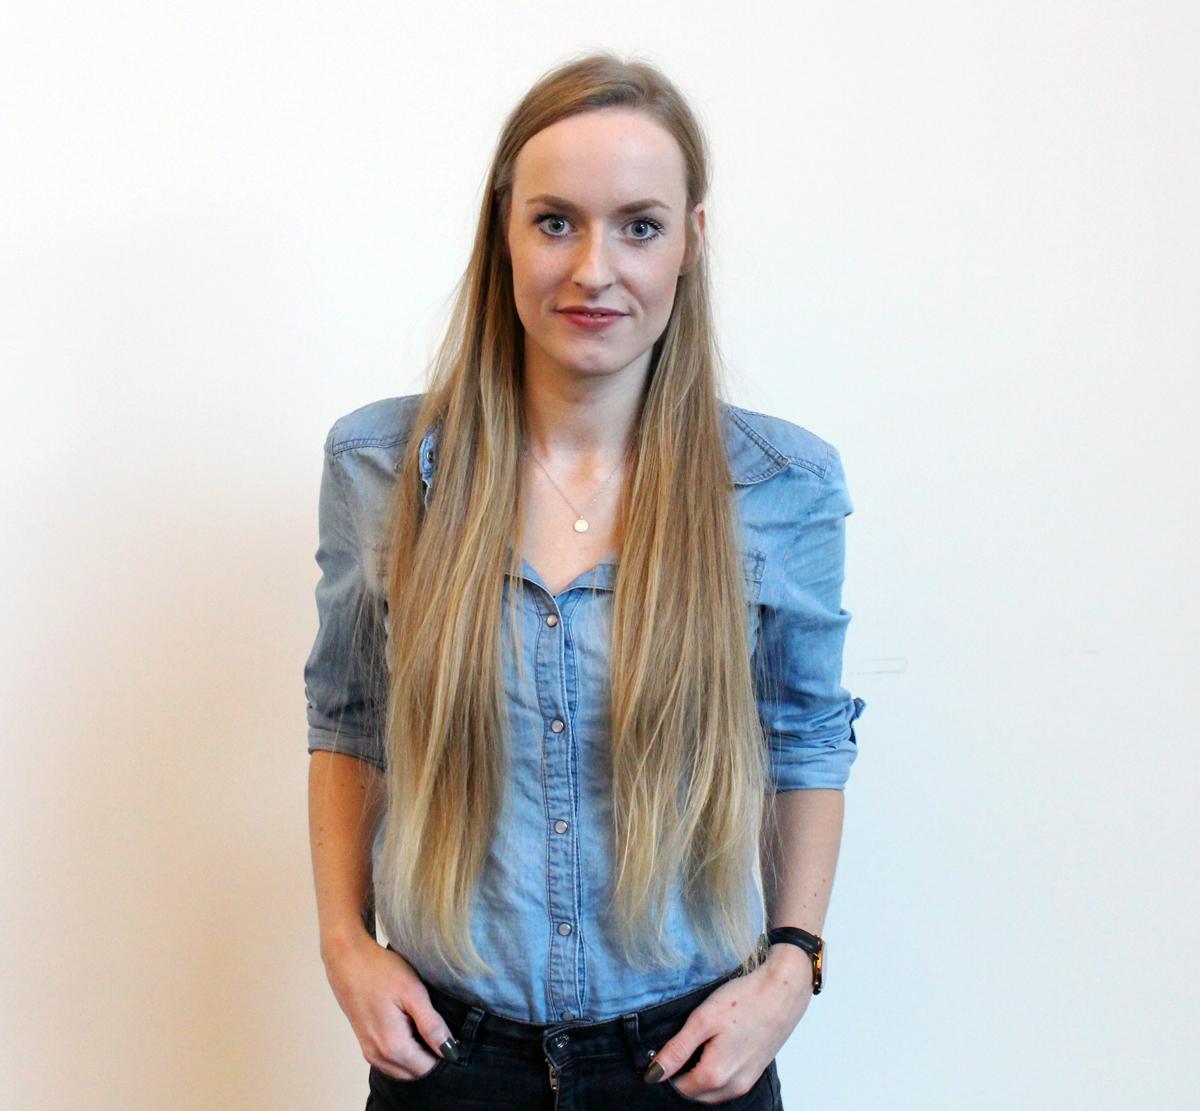 Annika Bonde